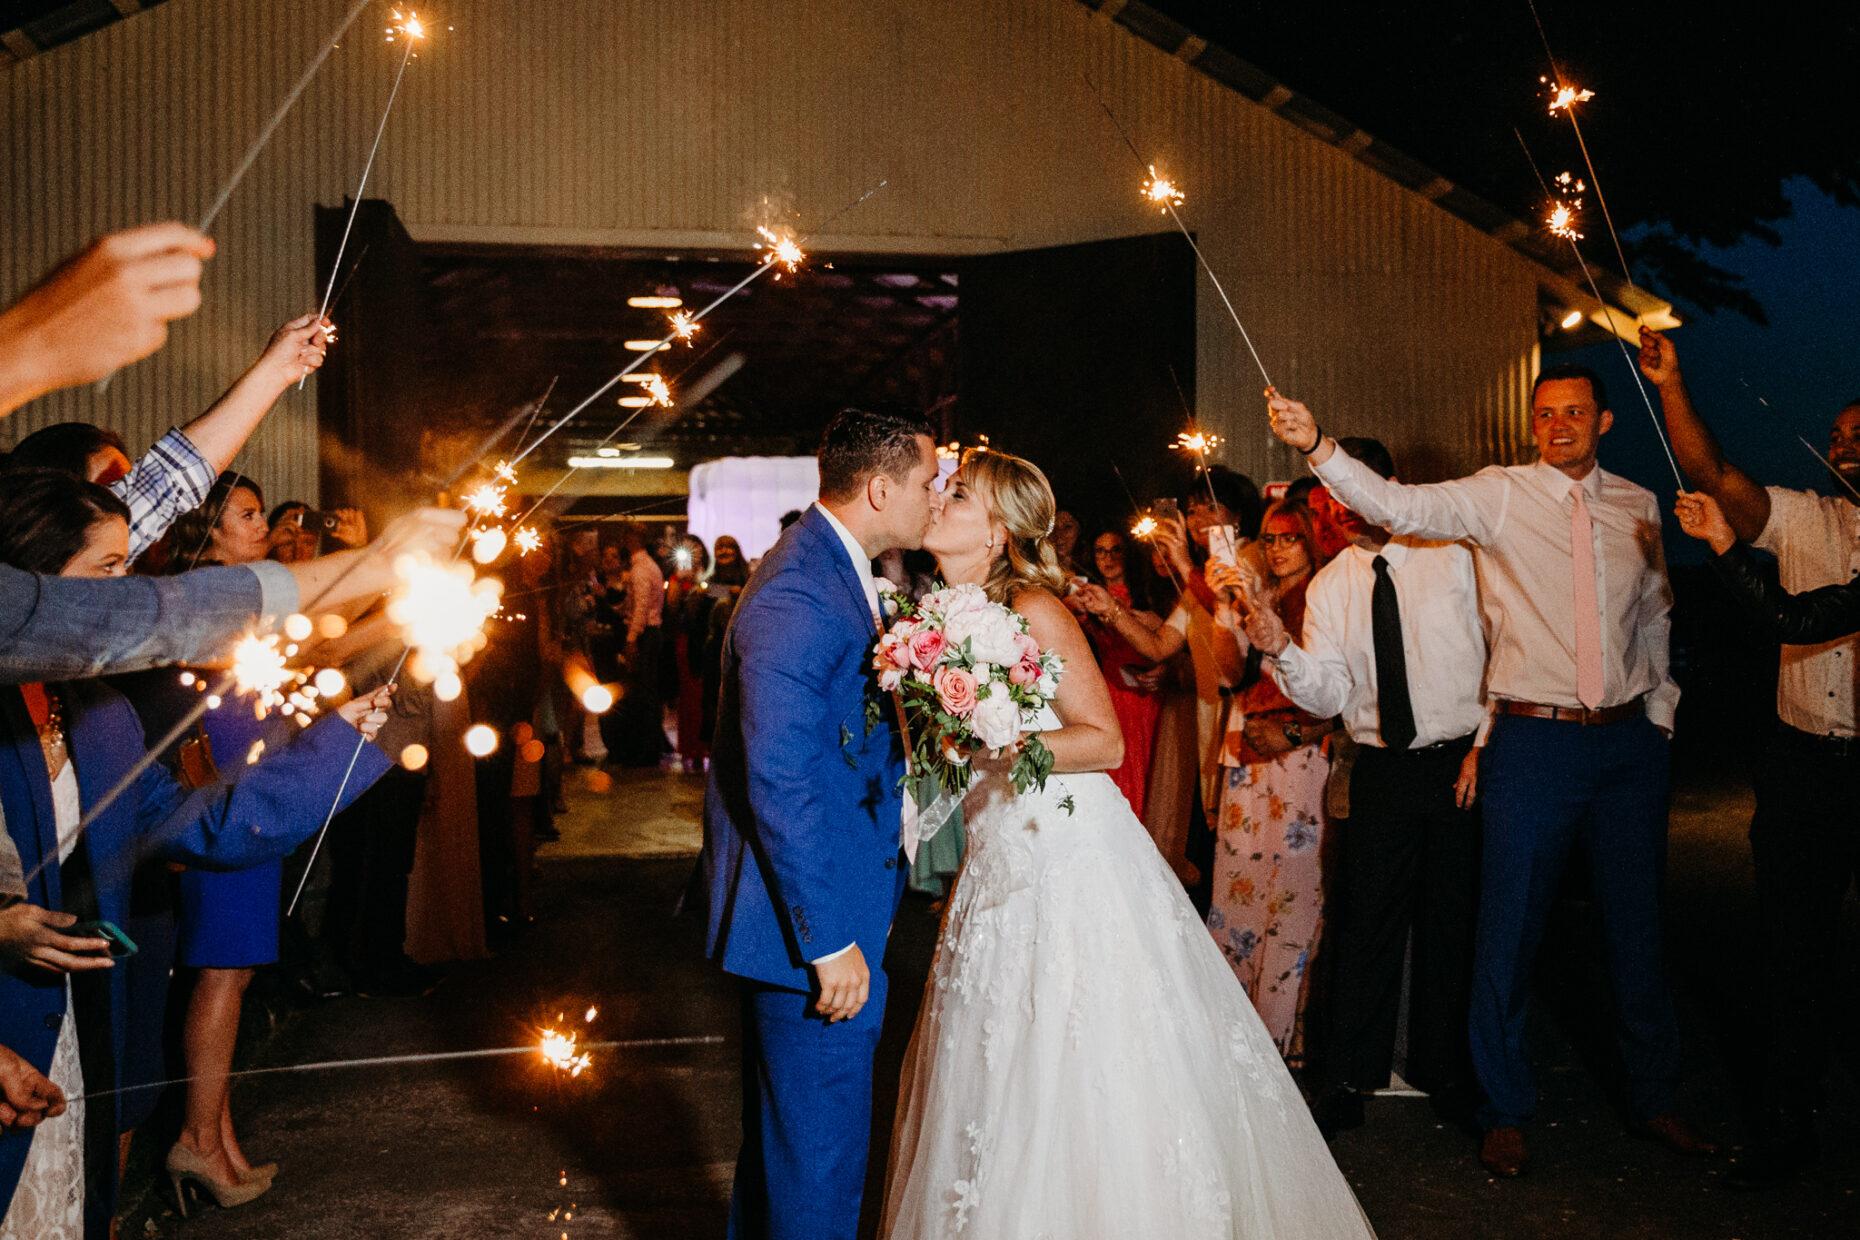 Wilson winery clarksburg Sacramento wedding sparkler exit